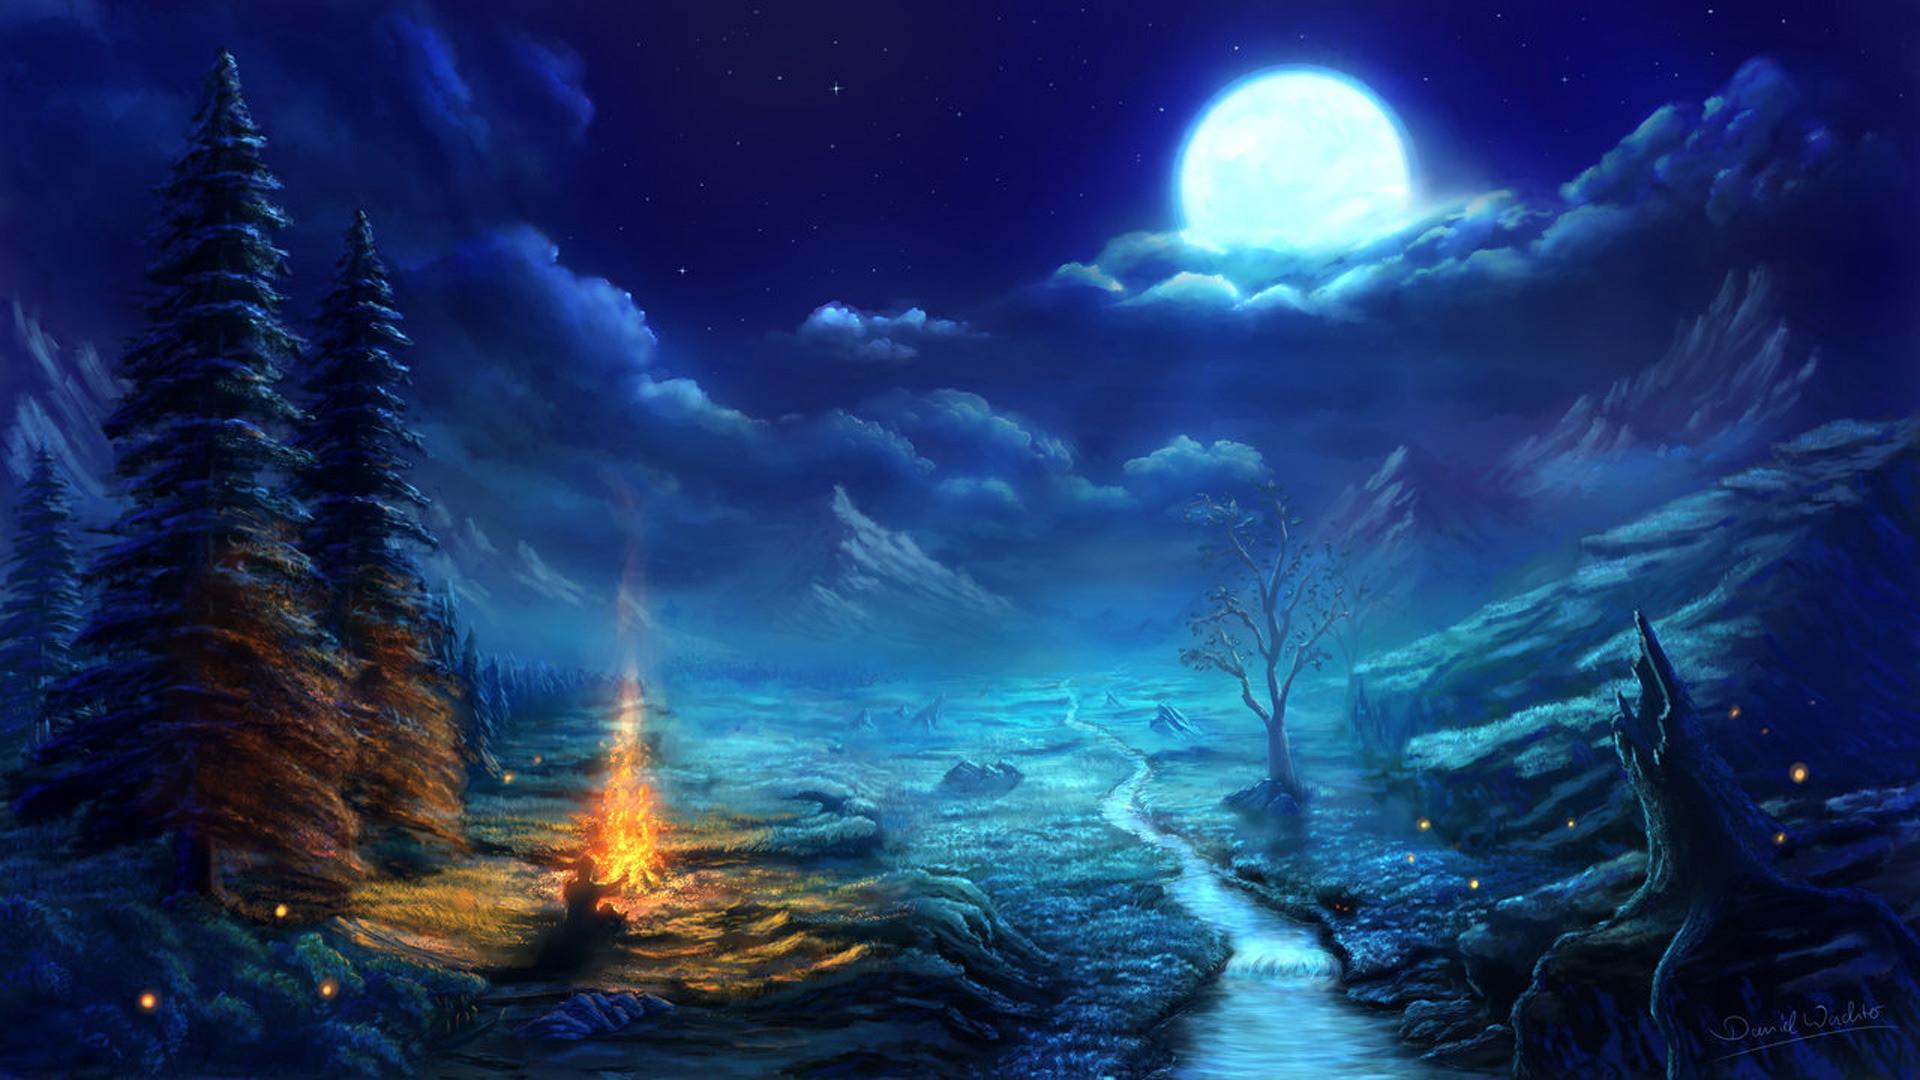 Anime Night Scene Wallpaper Amazing Resolution #o3306r3s